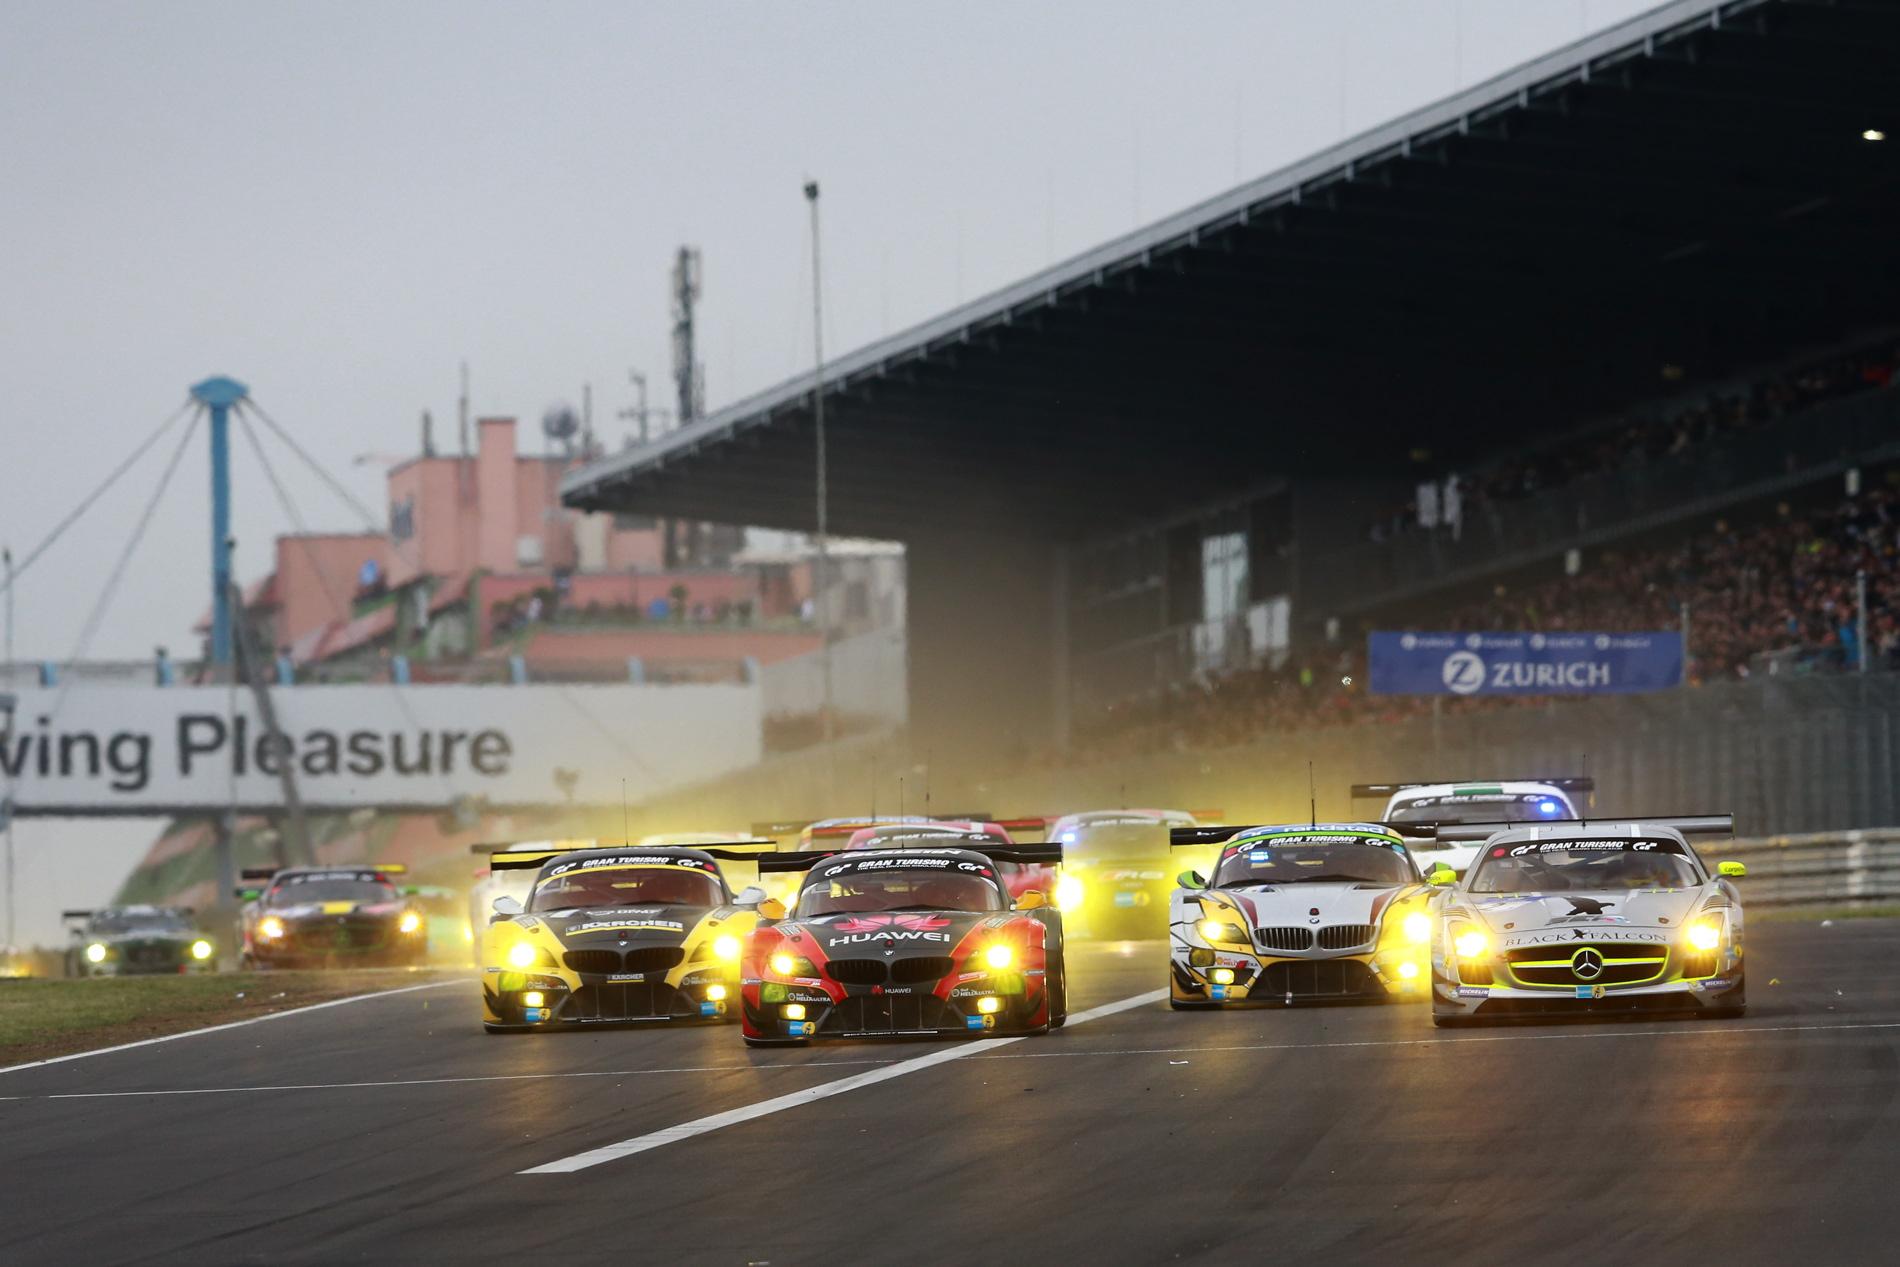 nurburgring 24 hrs images 10